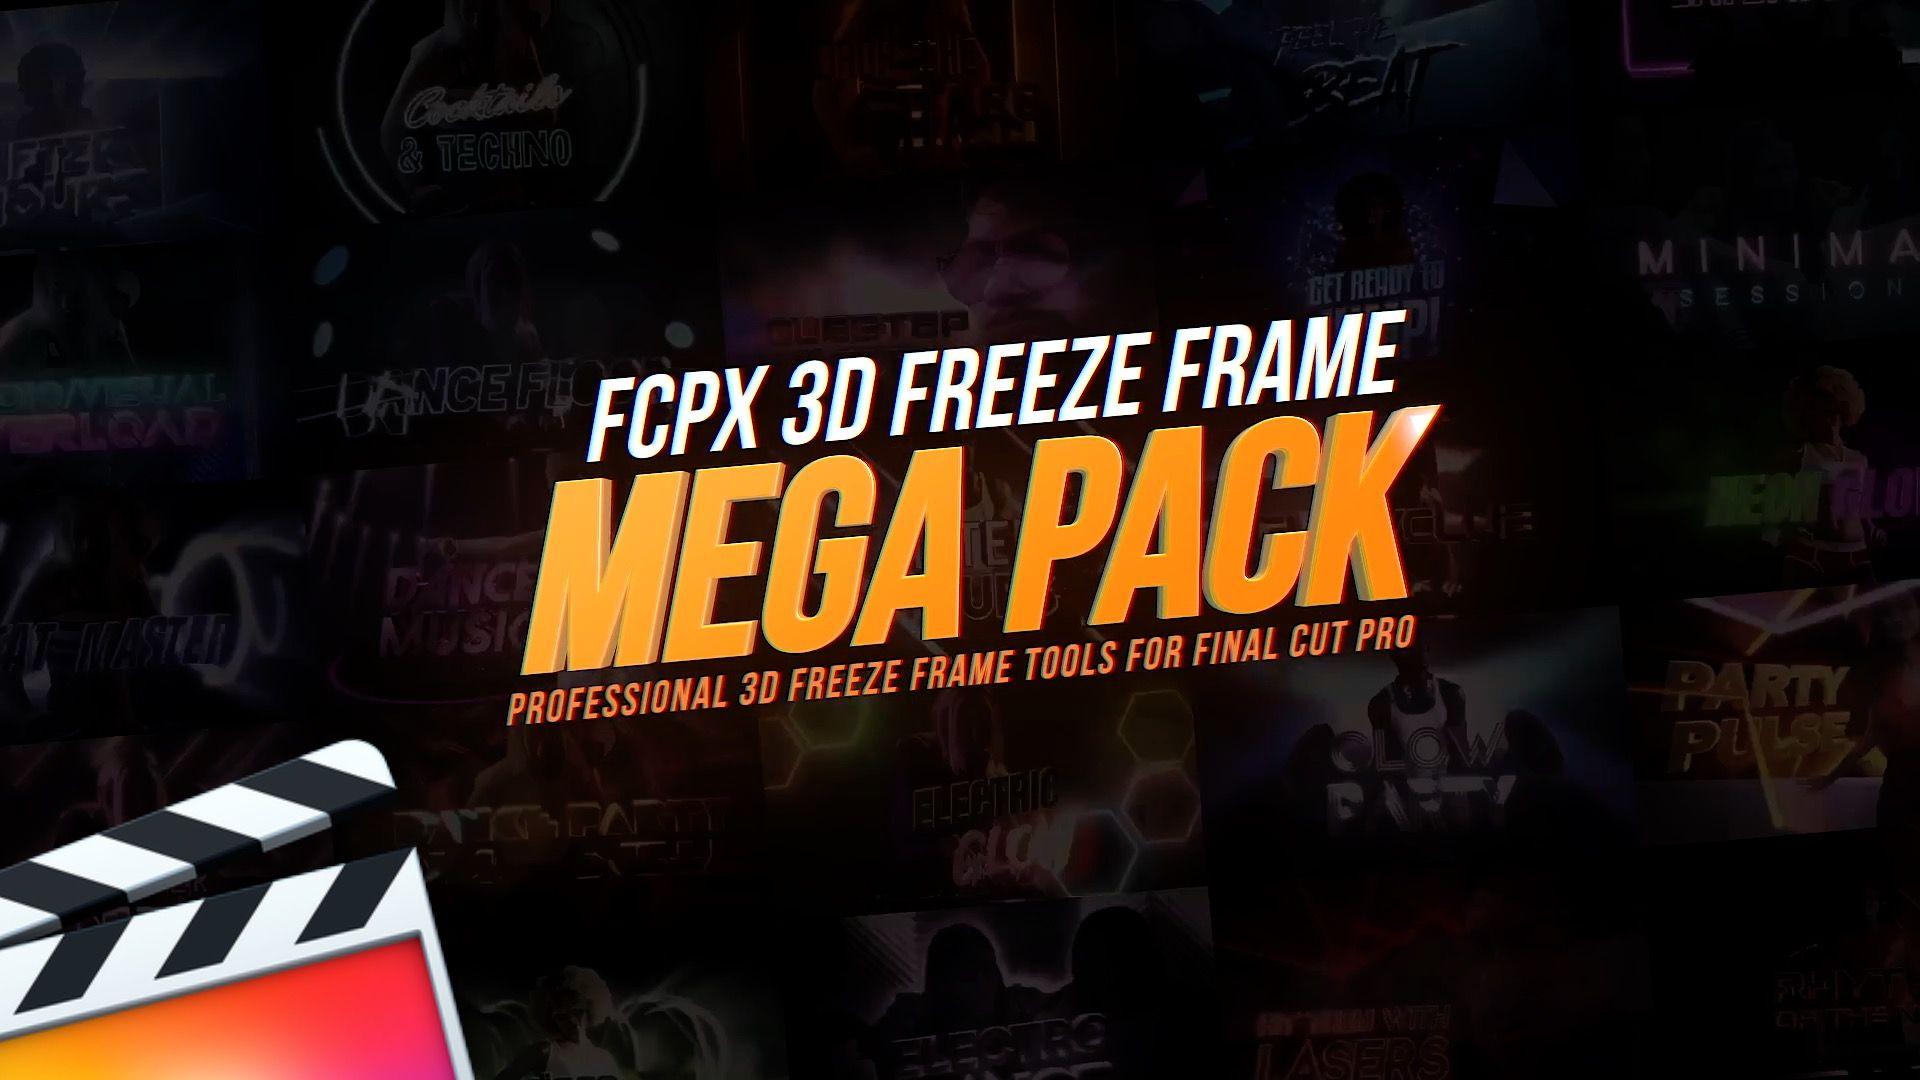 FCPX Freeze Frame Mega Pack Massive Collection of 3D